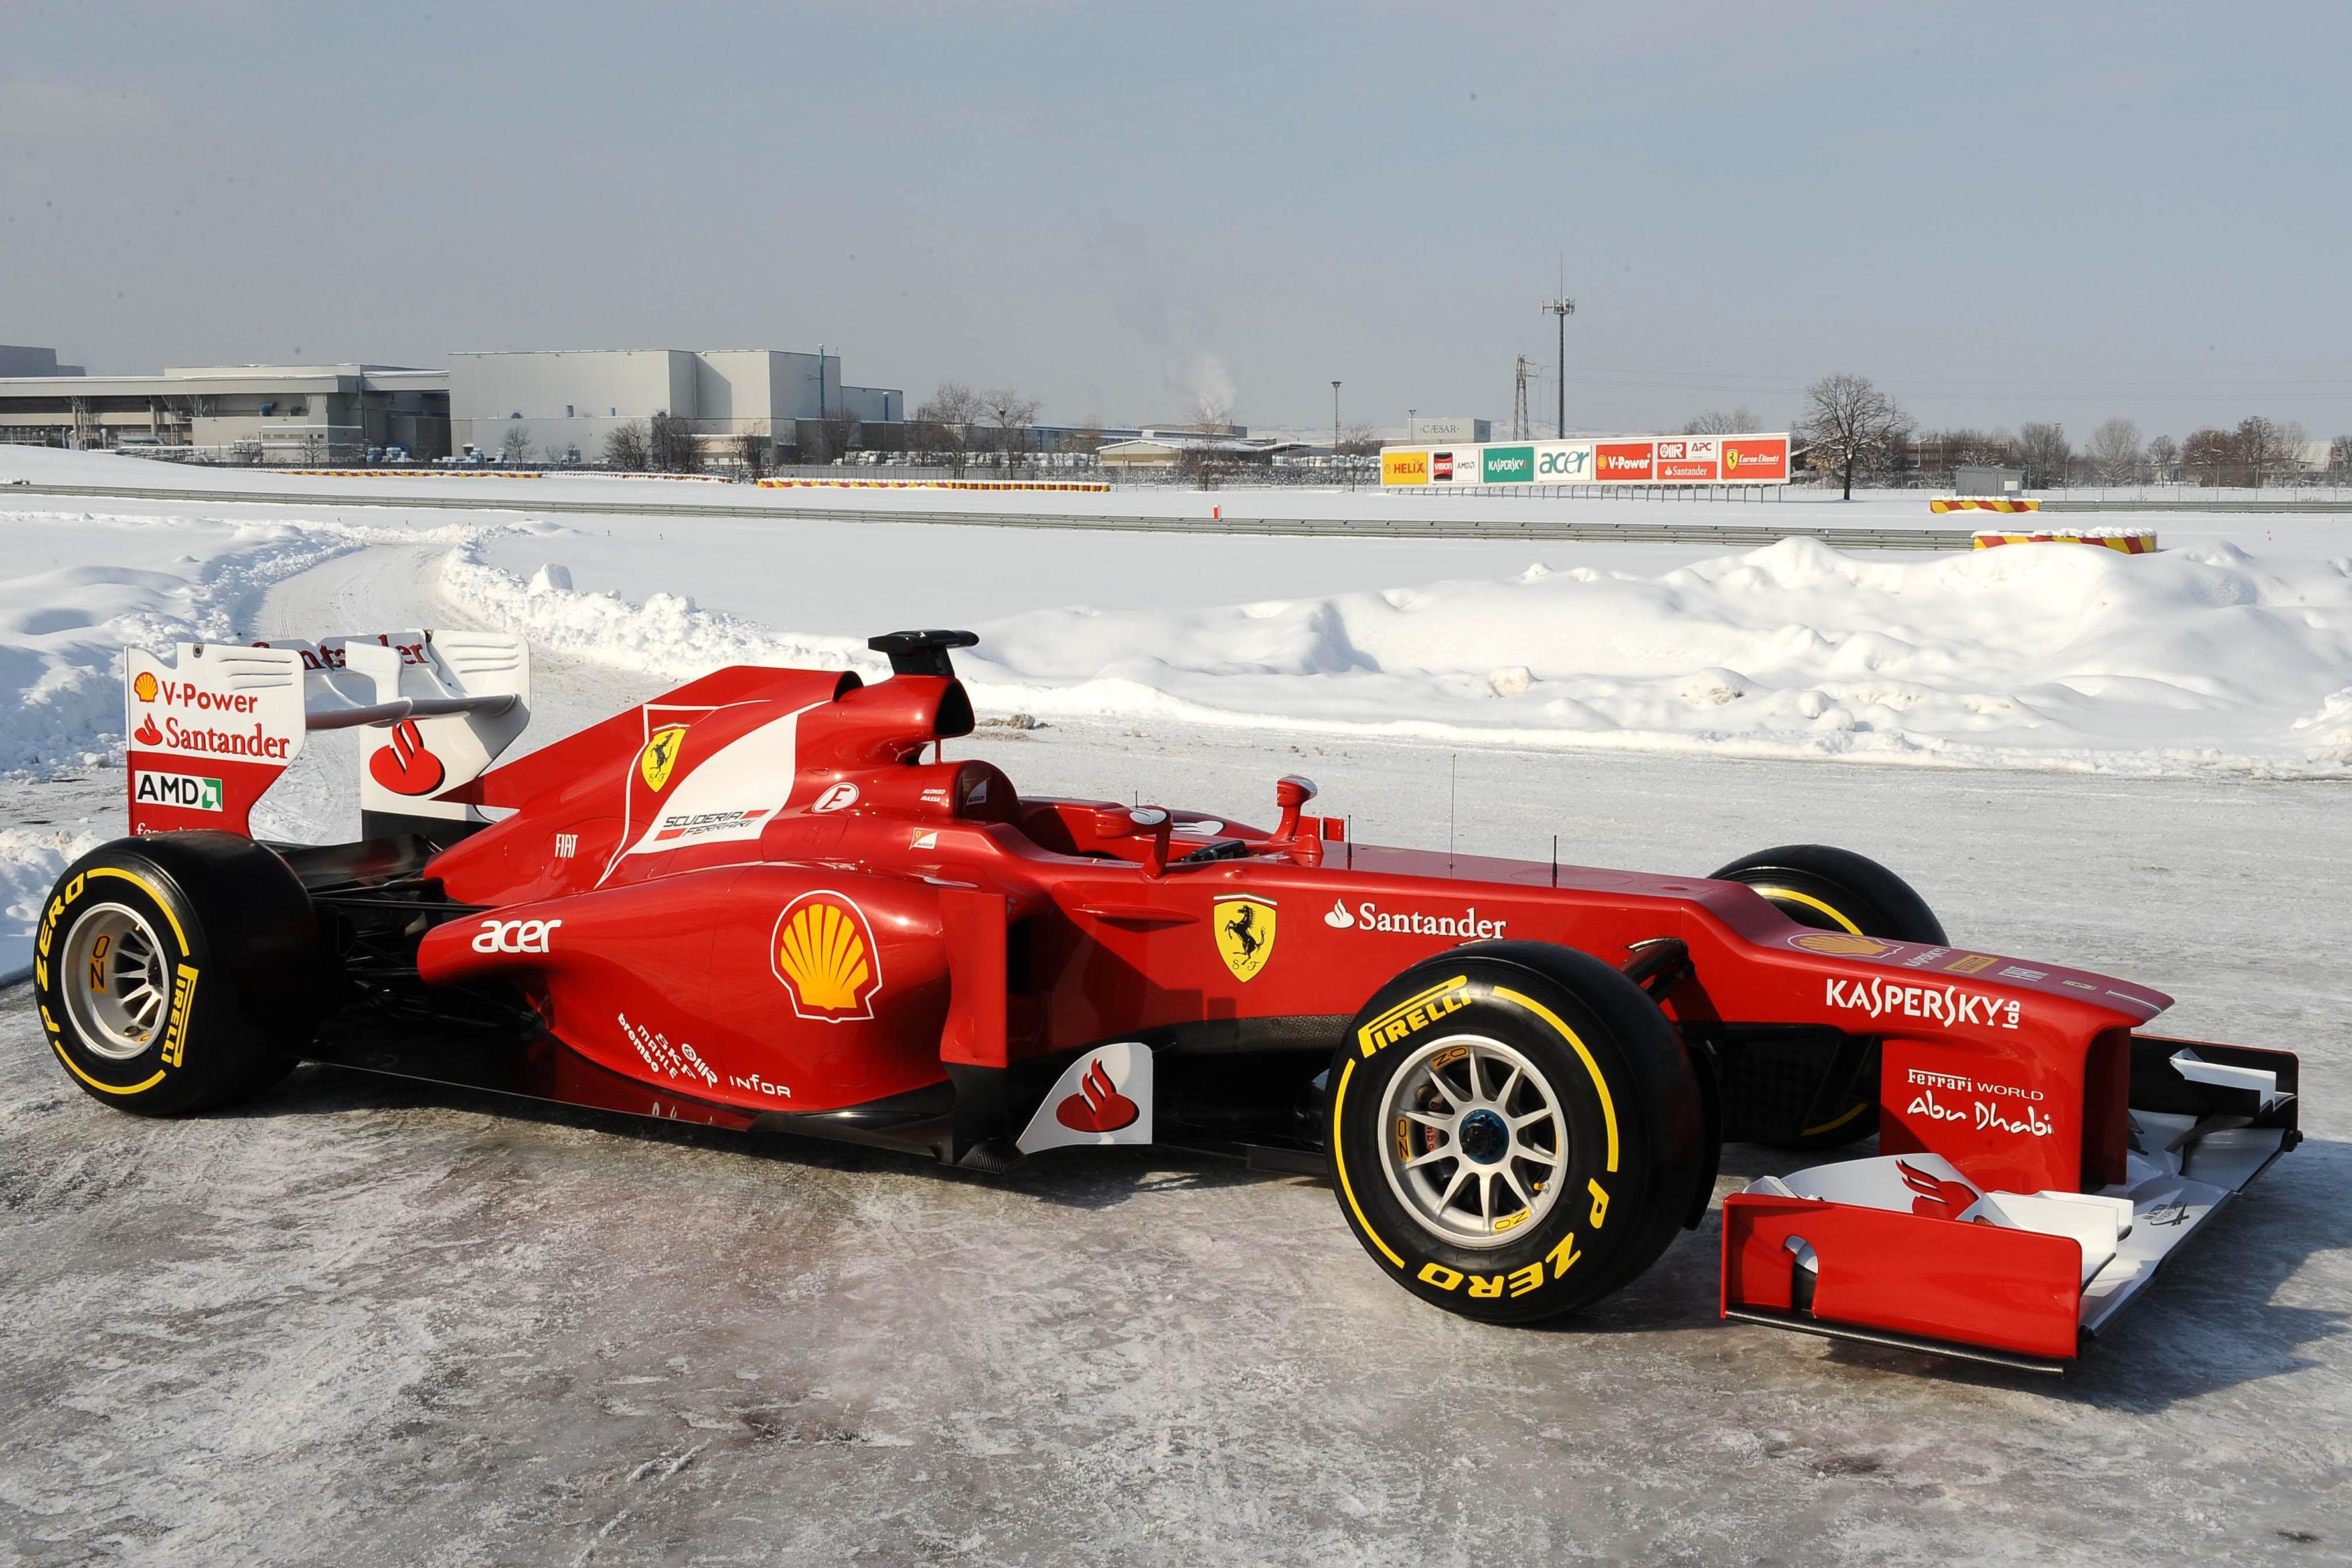 Formel Eins Erste Bilder Des Ferrari F2012 Force India Vjm005 Racingblog